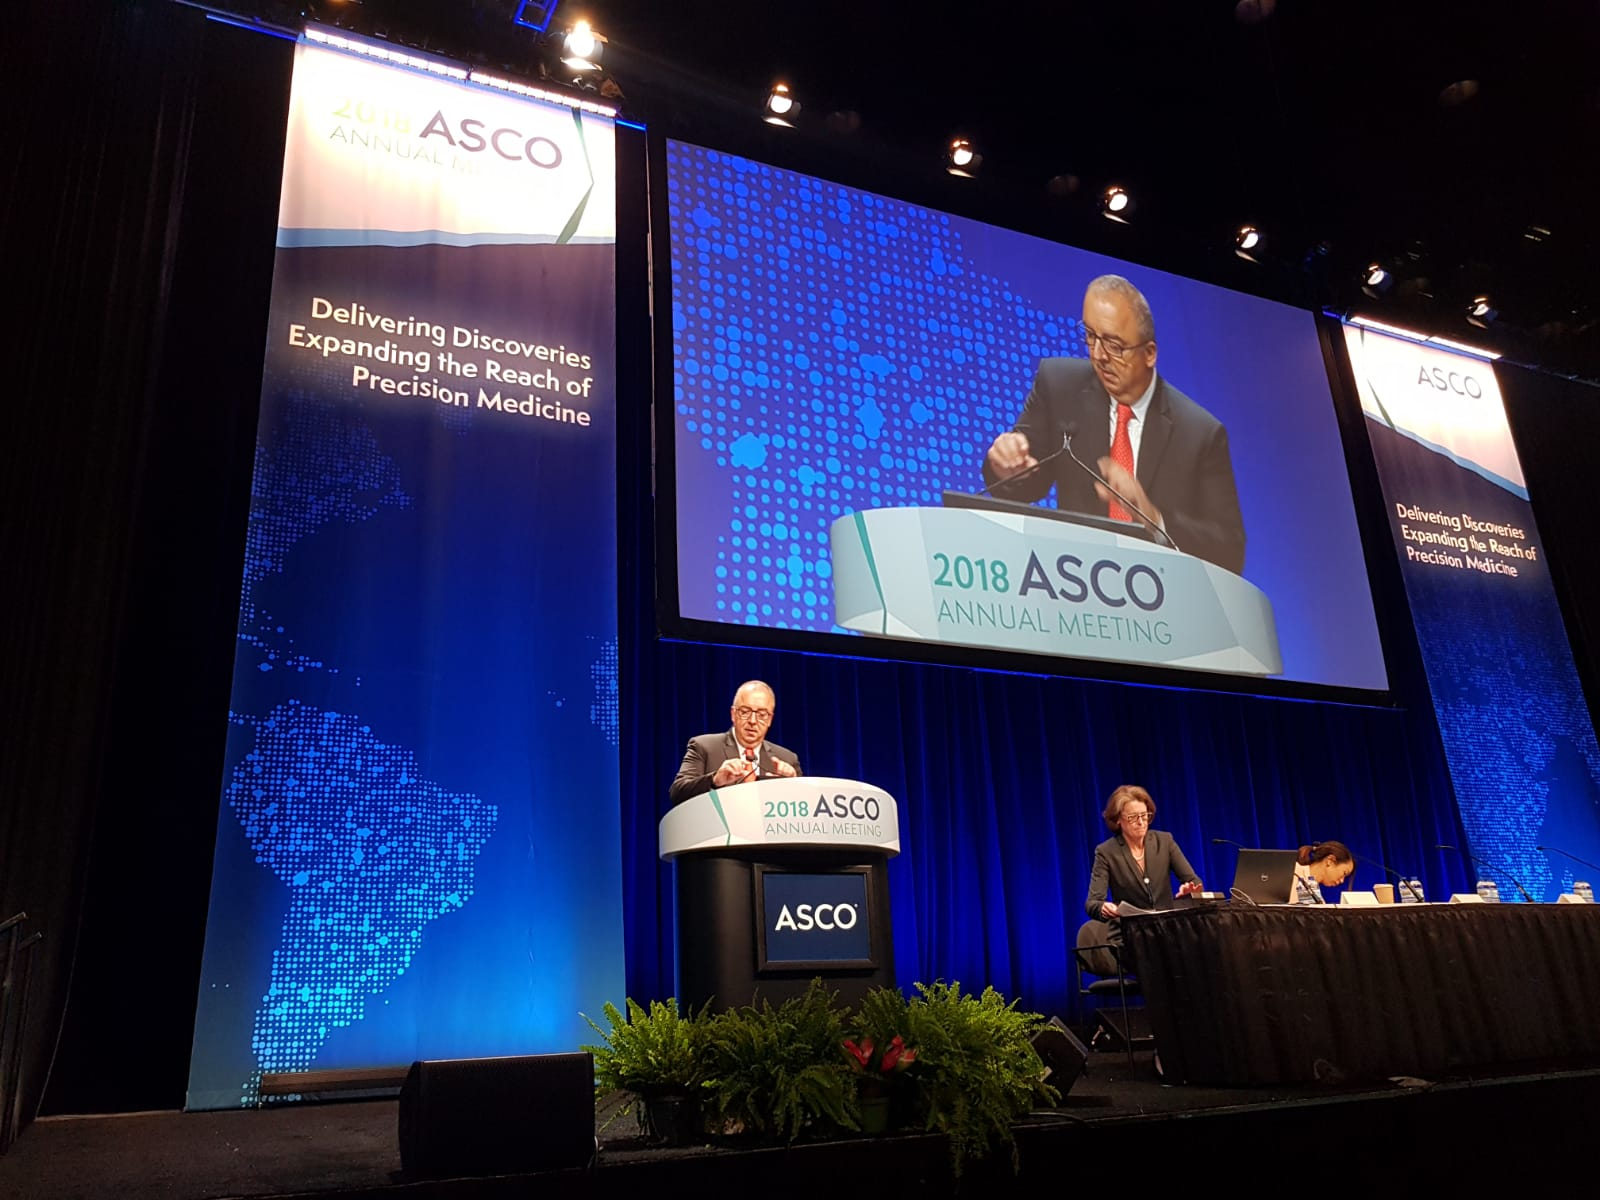 ABCSG 18 am ASCO 2018